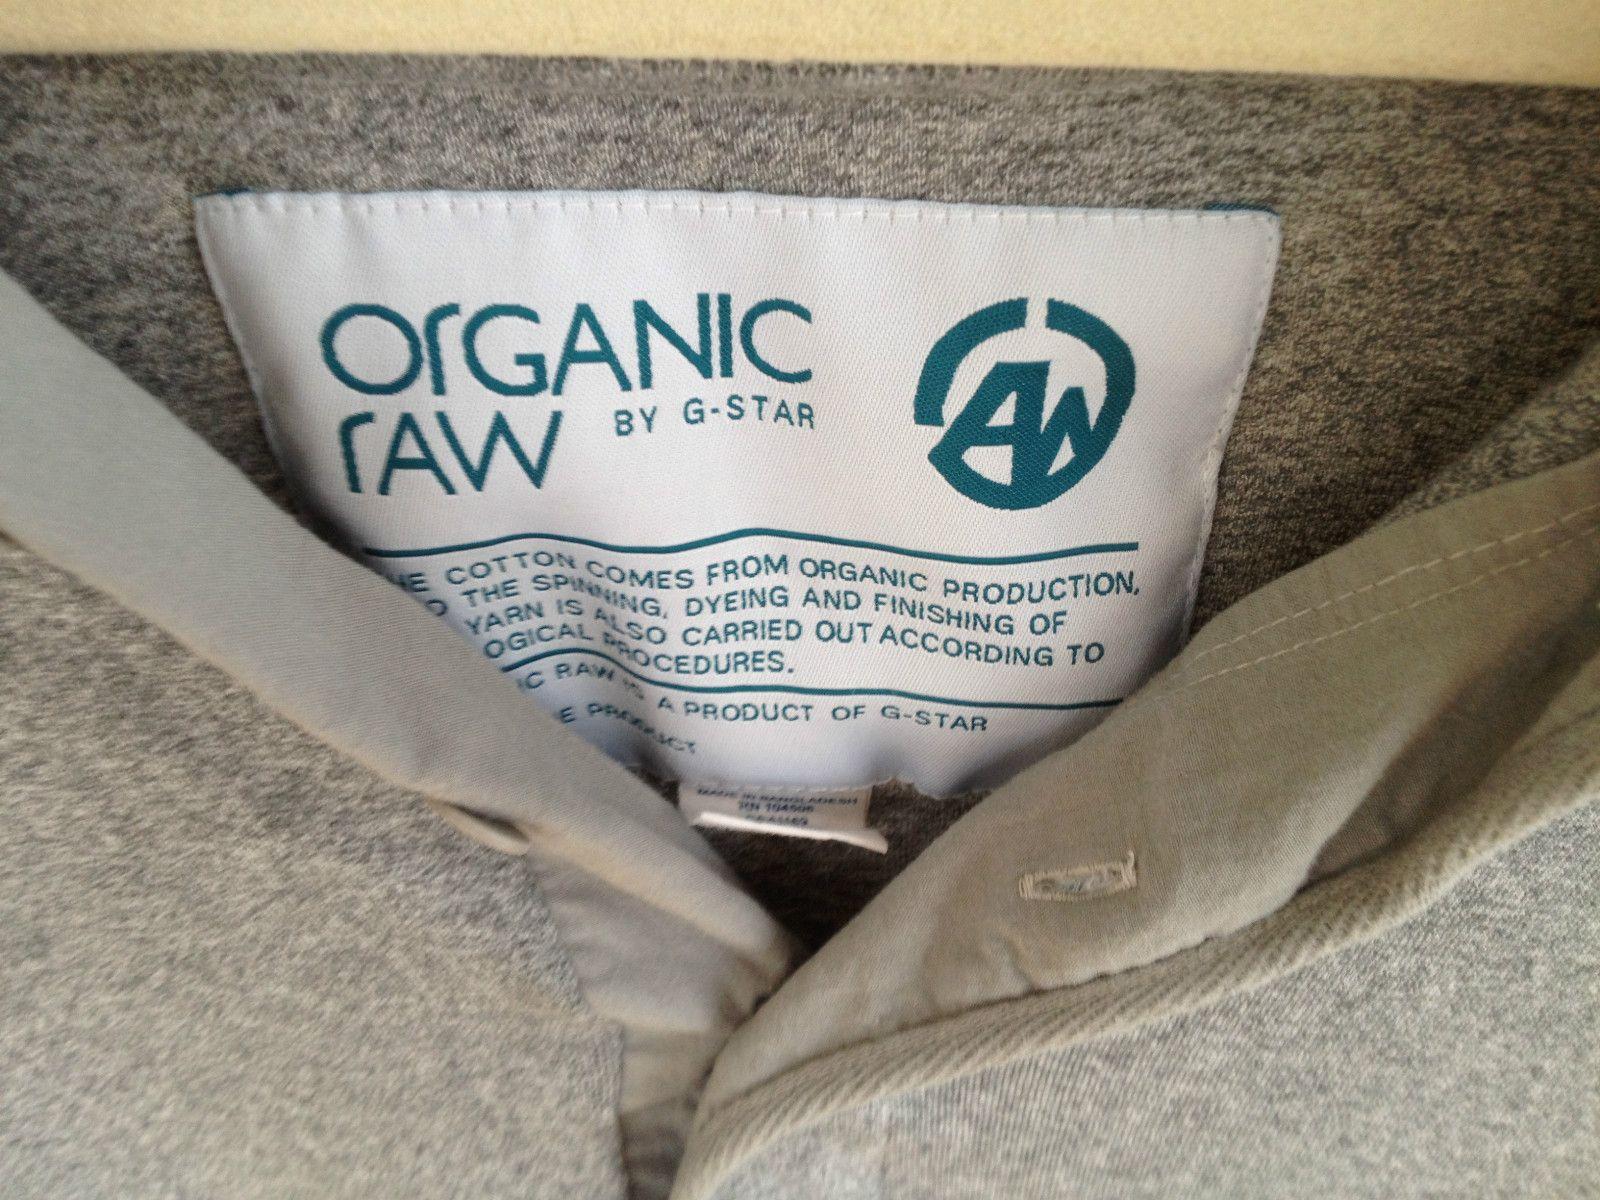 G star ORGANIC RAW t shirt.